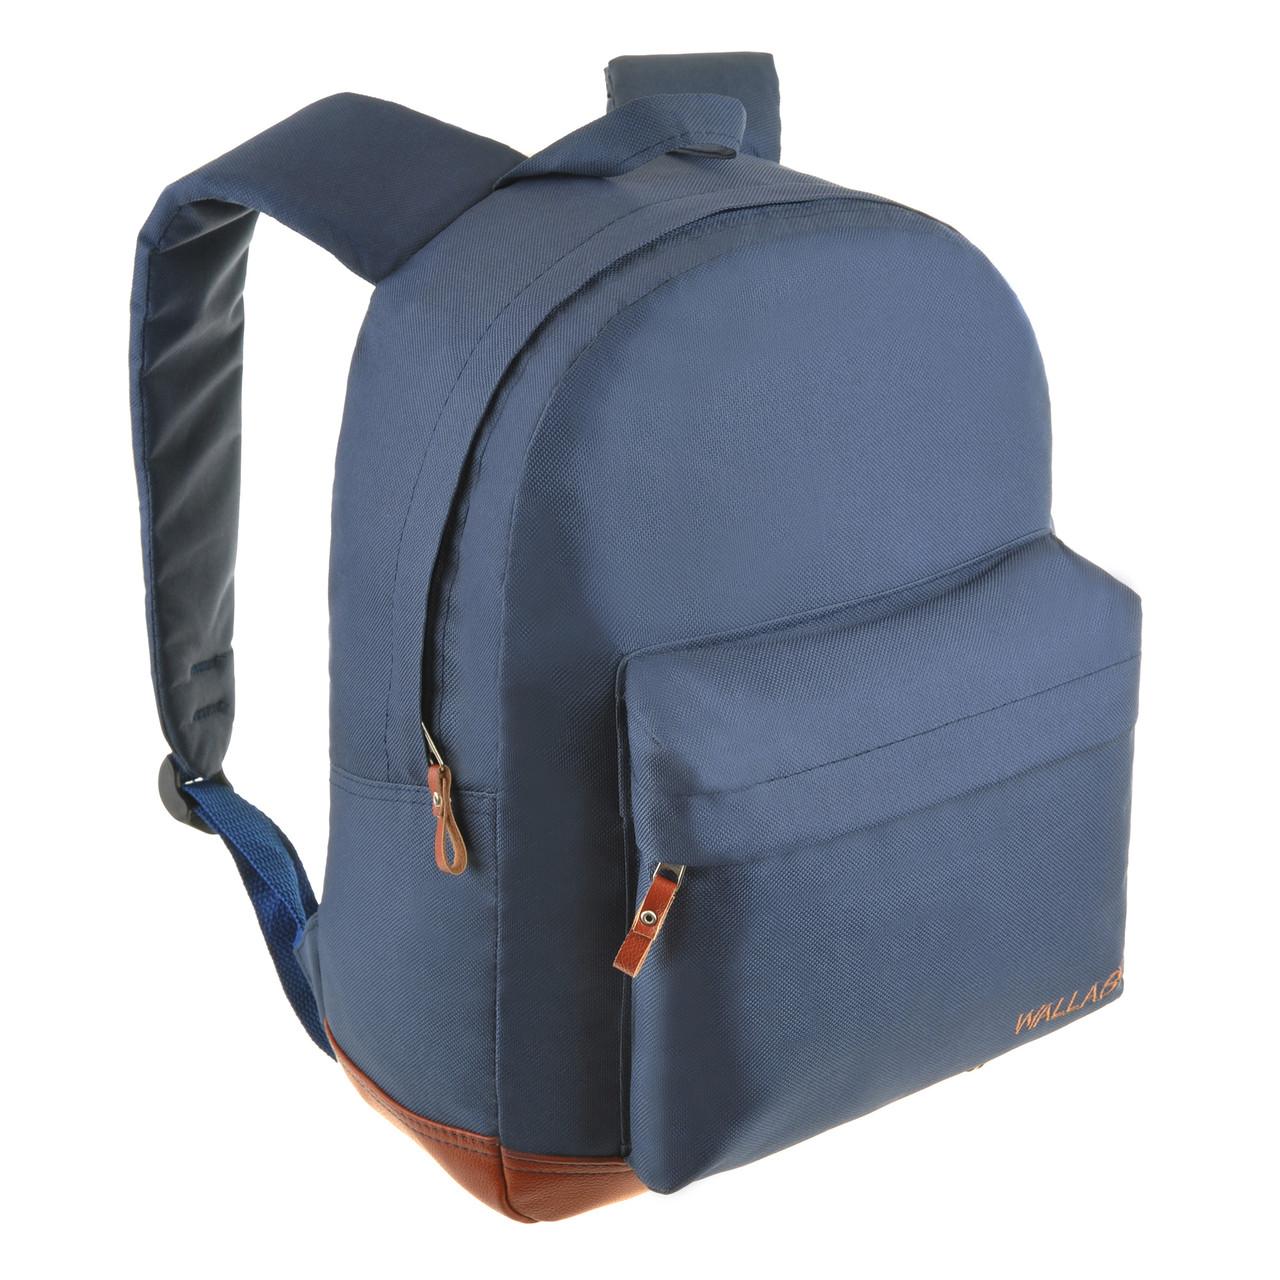 Рюкзак городской Wallaby 29 х 35 х 15 синий полиестр на ПВХ основев 1351син кор